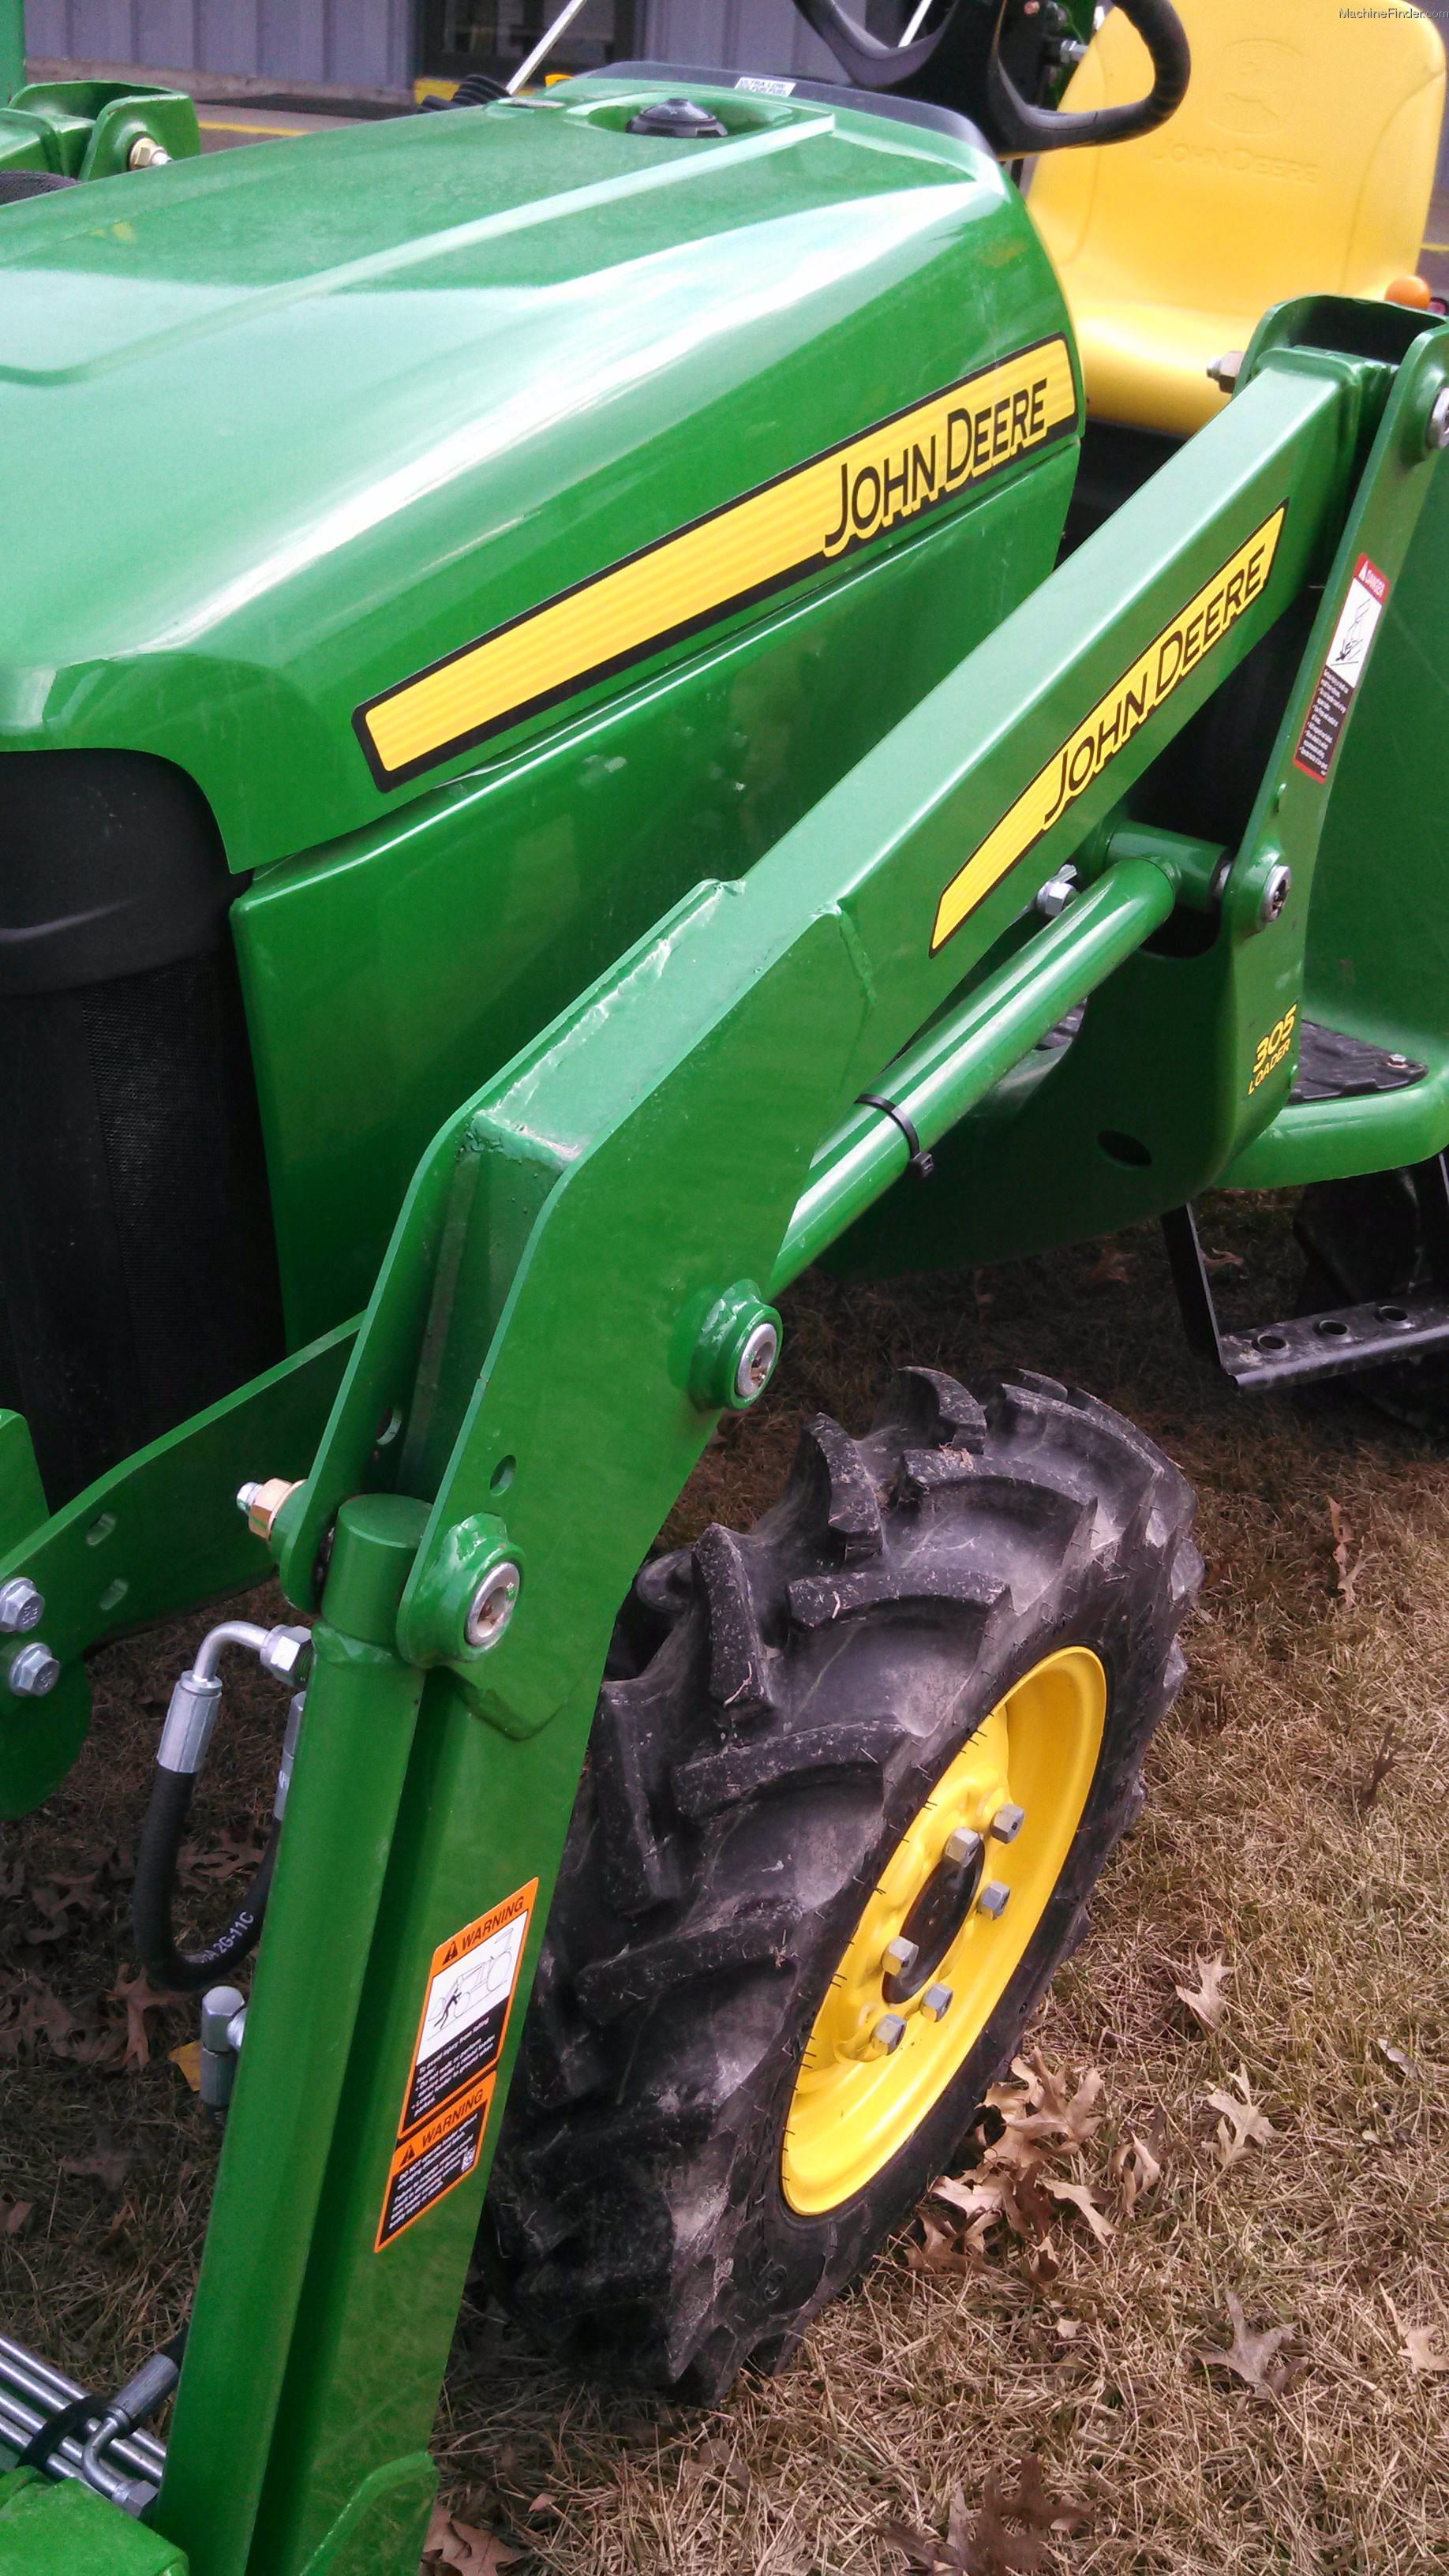 2013 John Deere 3032E Tractors - Compact (1-40hp.) - John ...